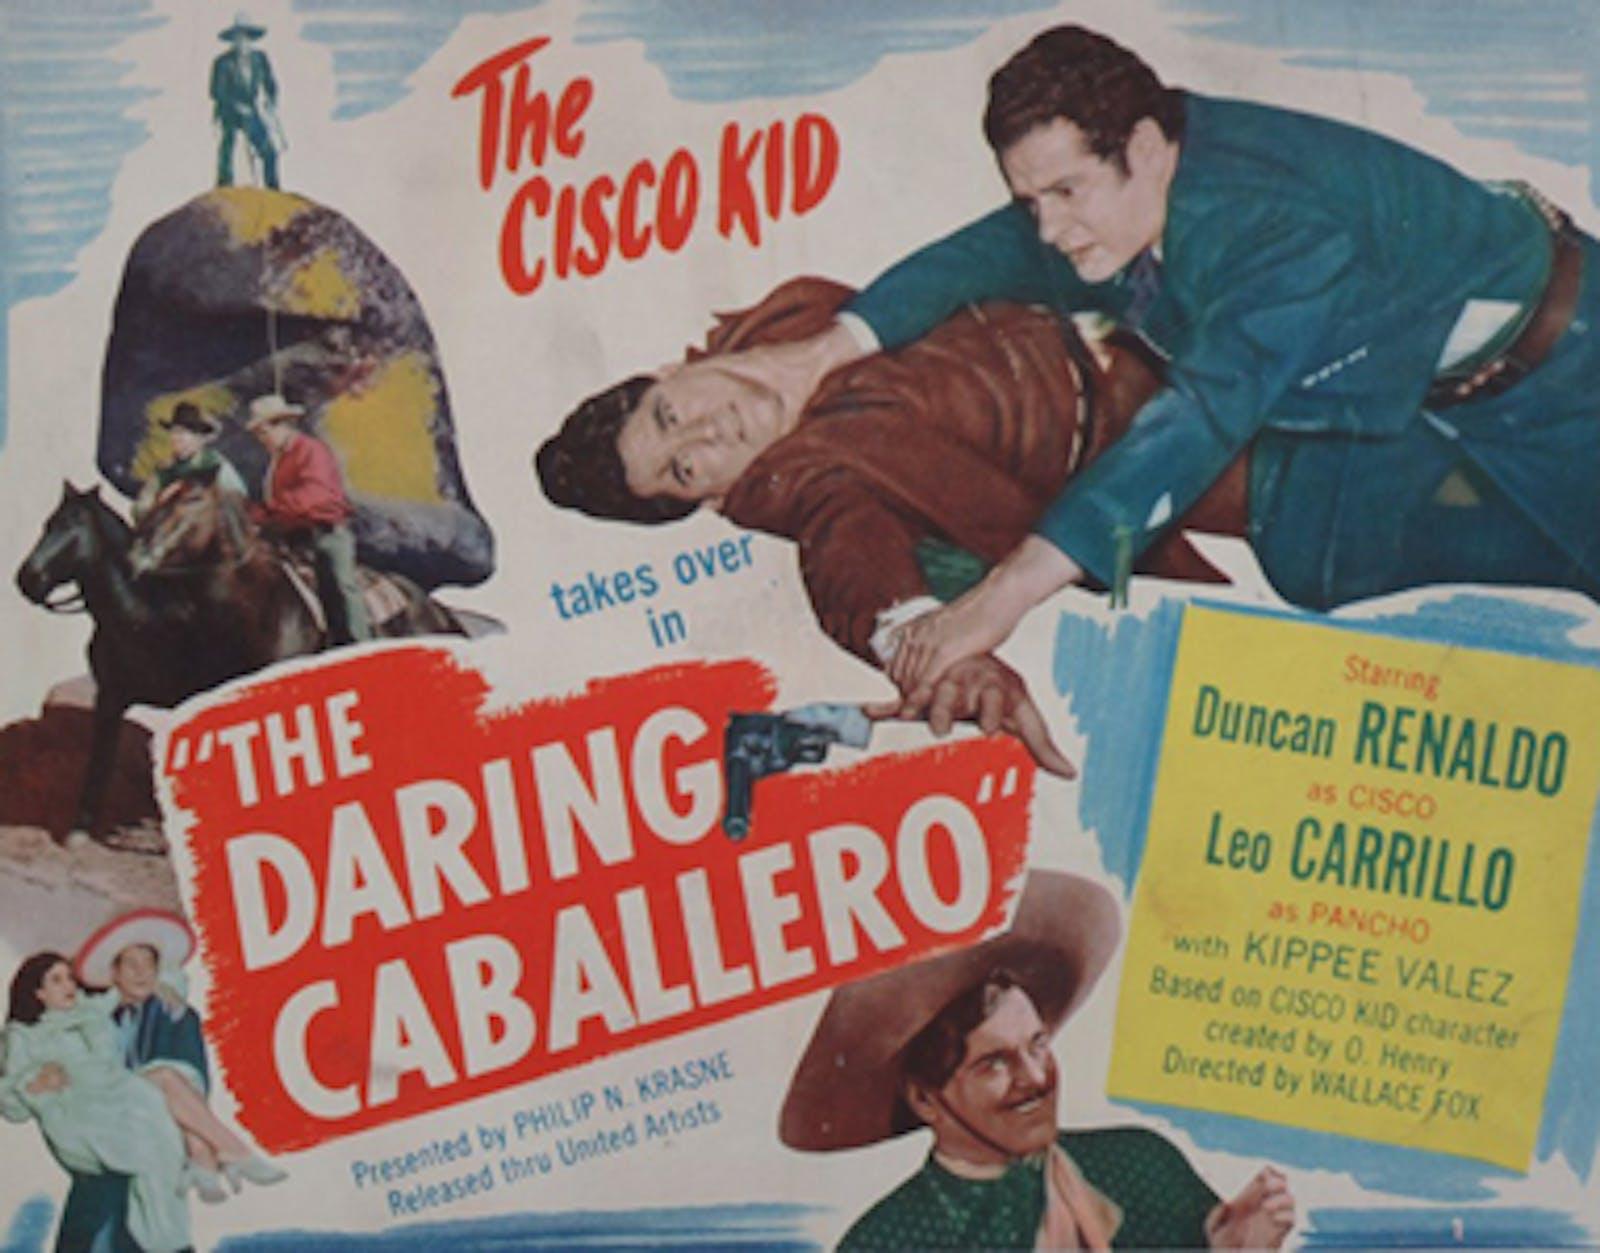 The Daring Caballero lobby card